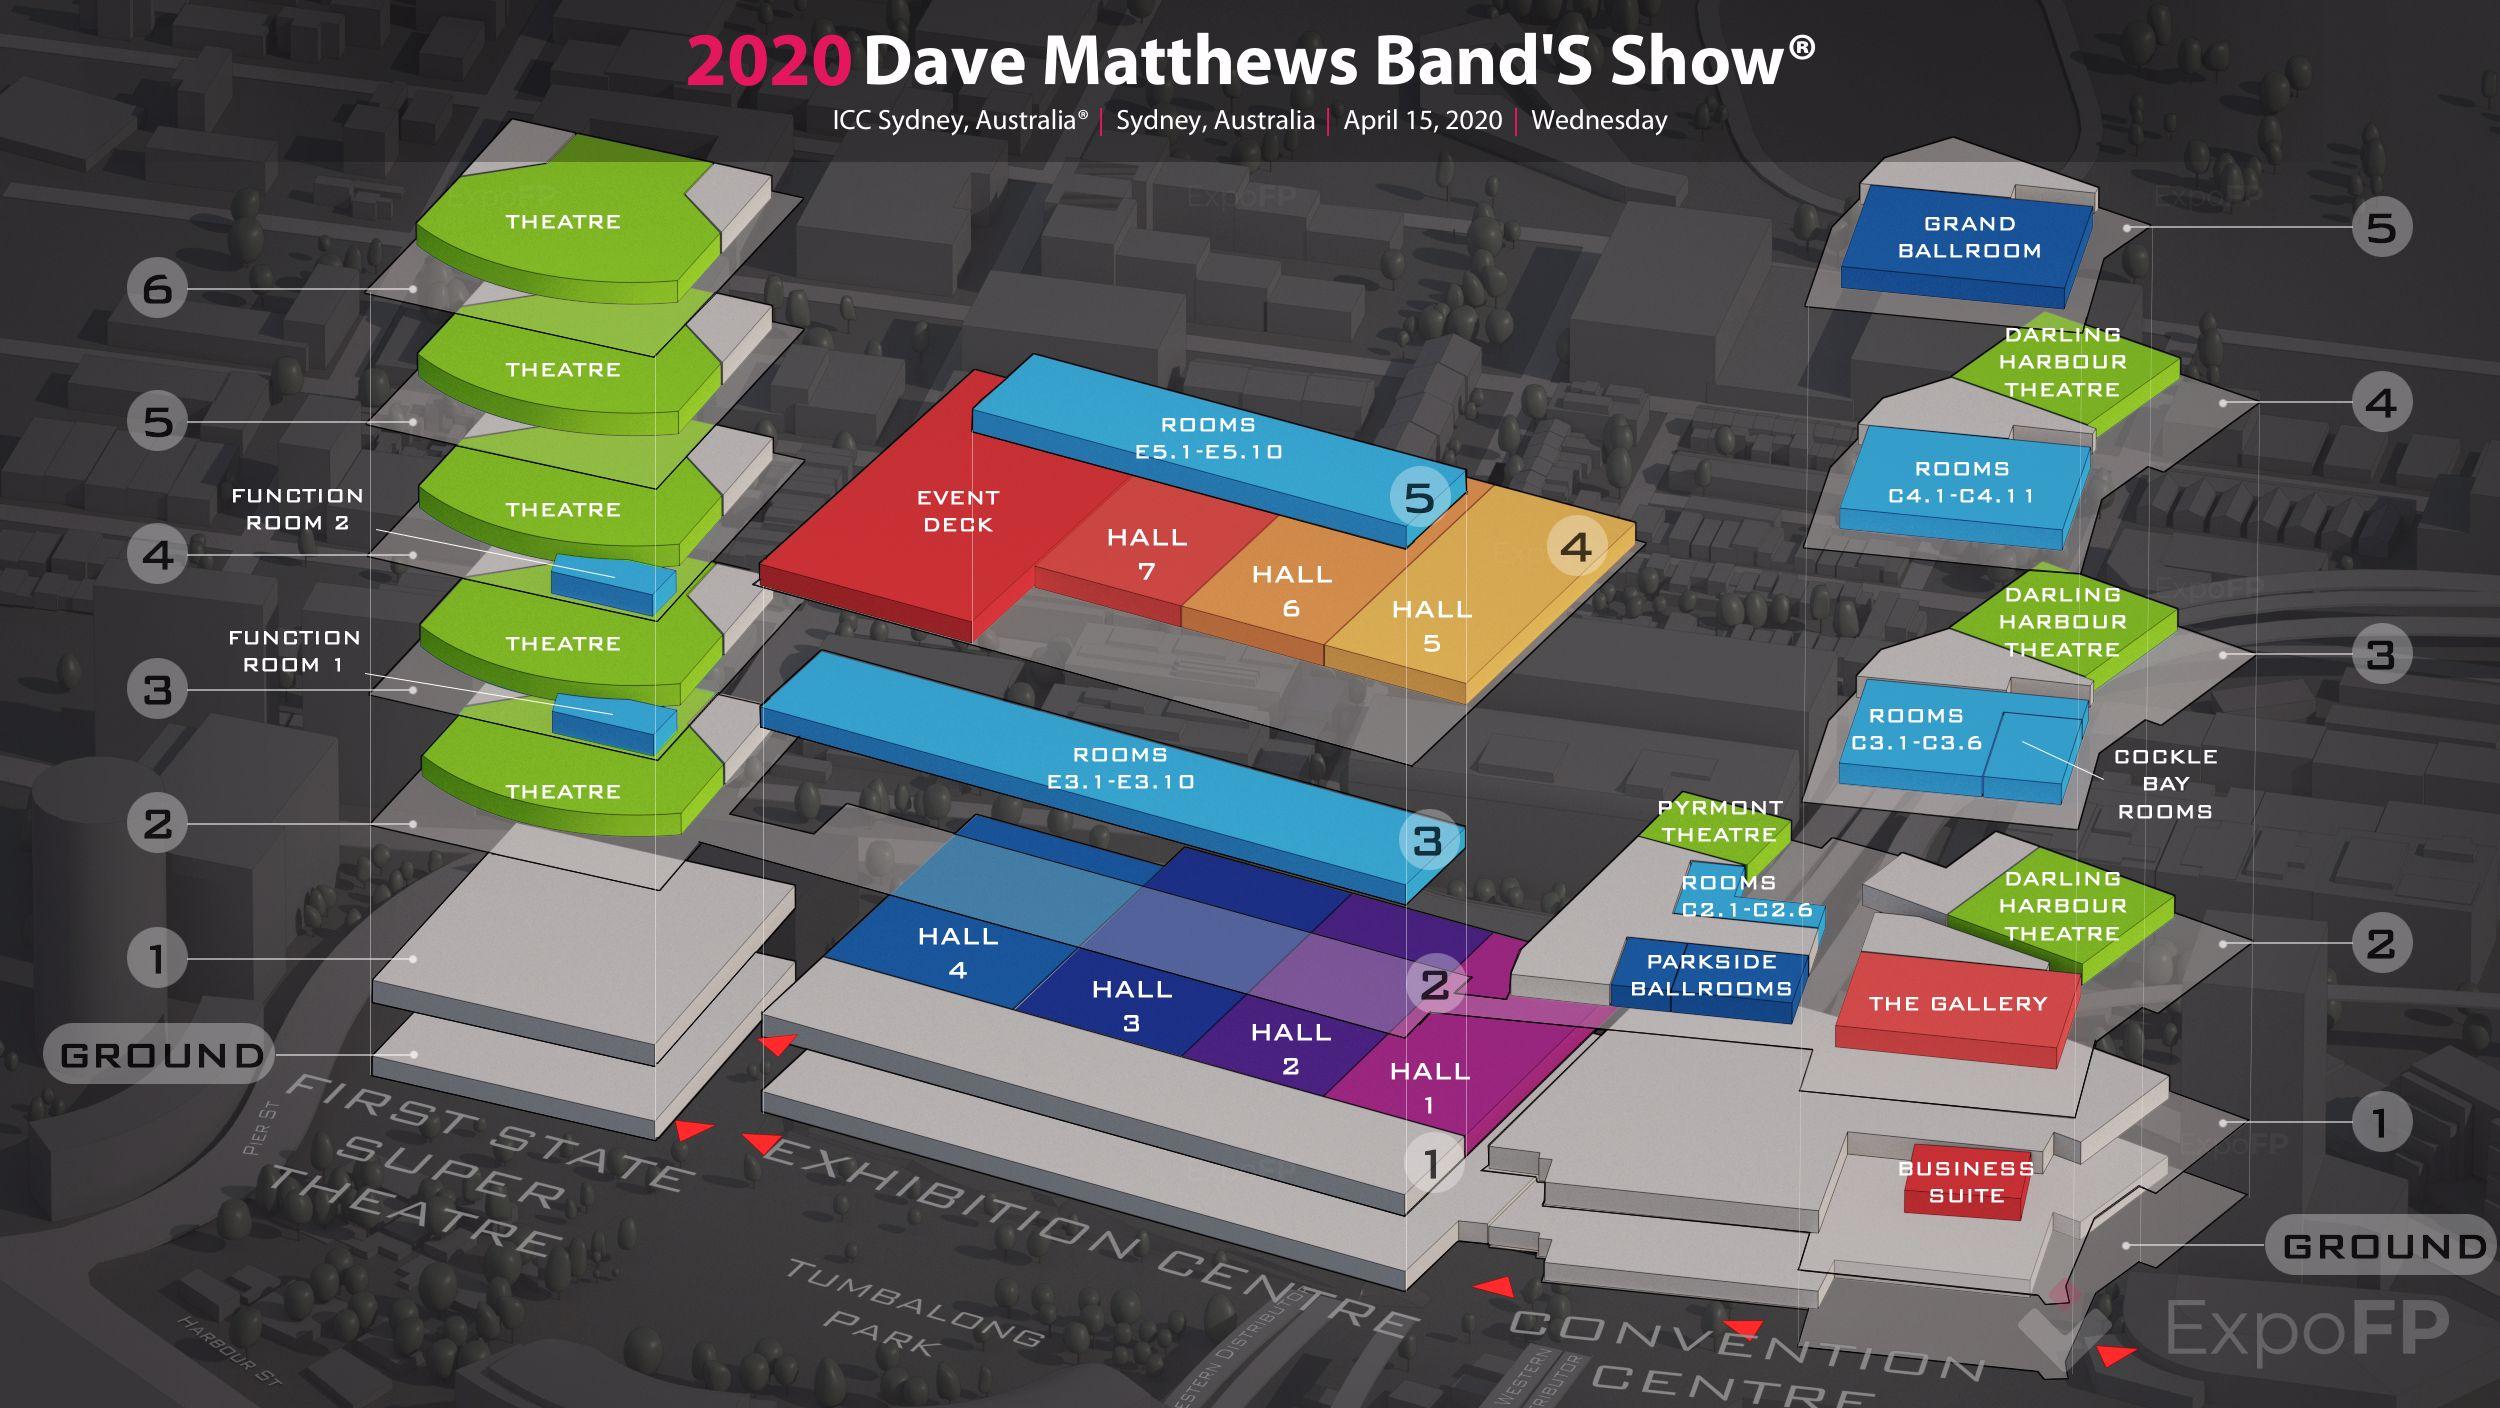 Dave Matthews Band Tour 2020.Dave Matthews Band S Show 2020 In Icc Sydney